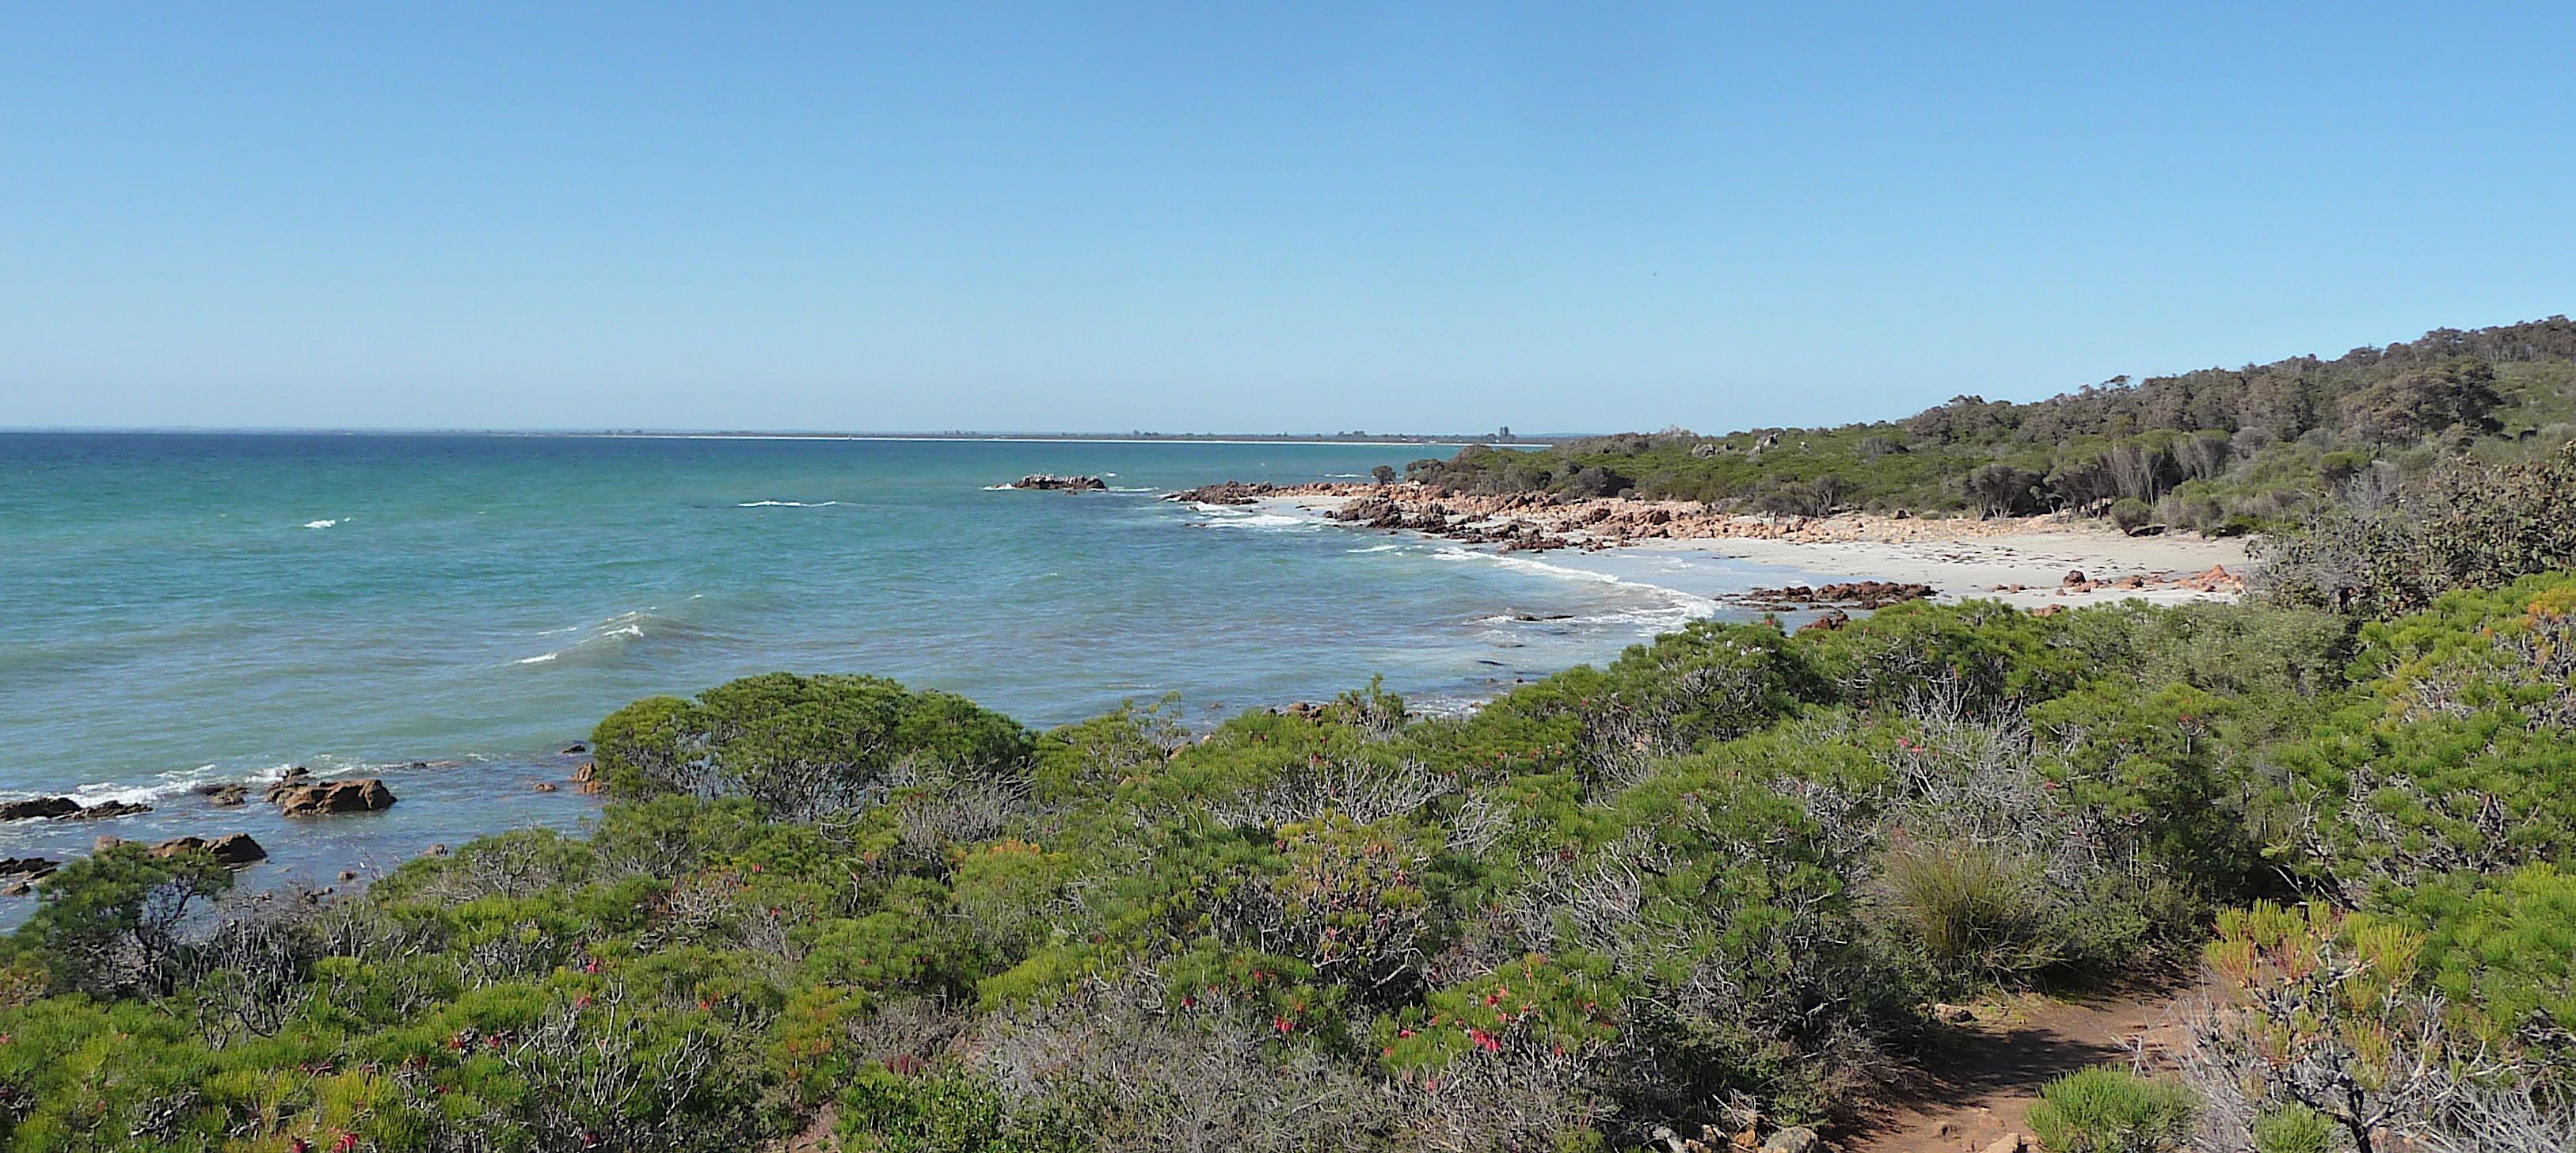 15.Geographe Bay